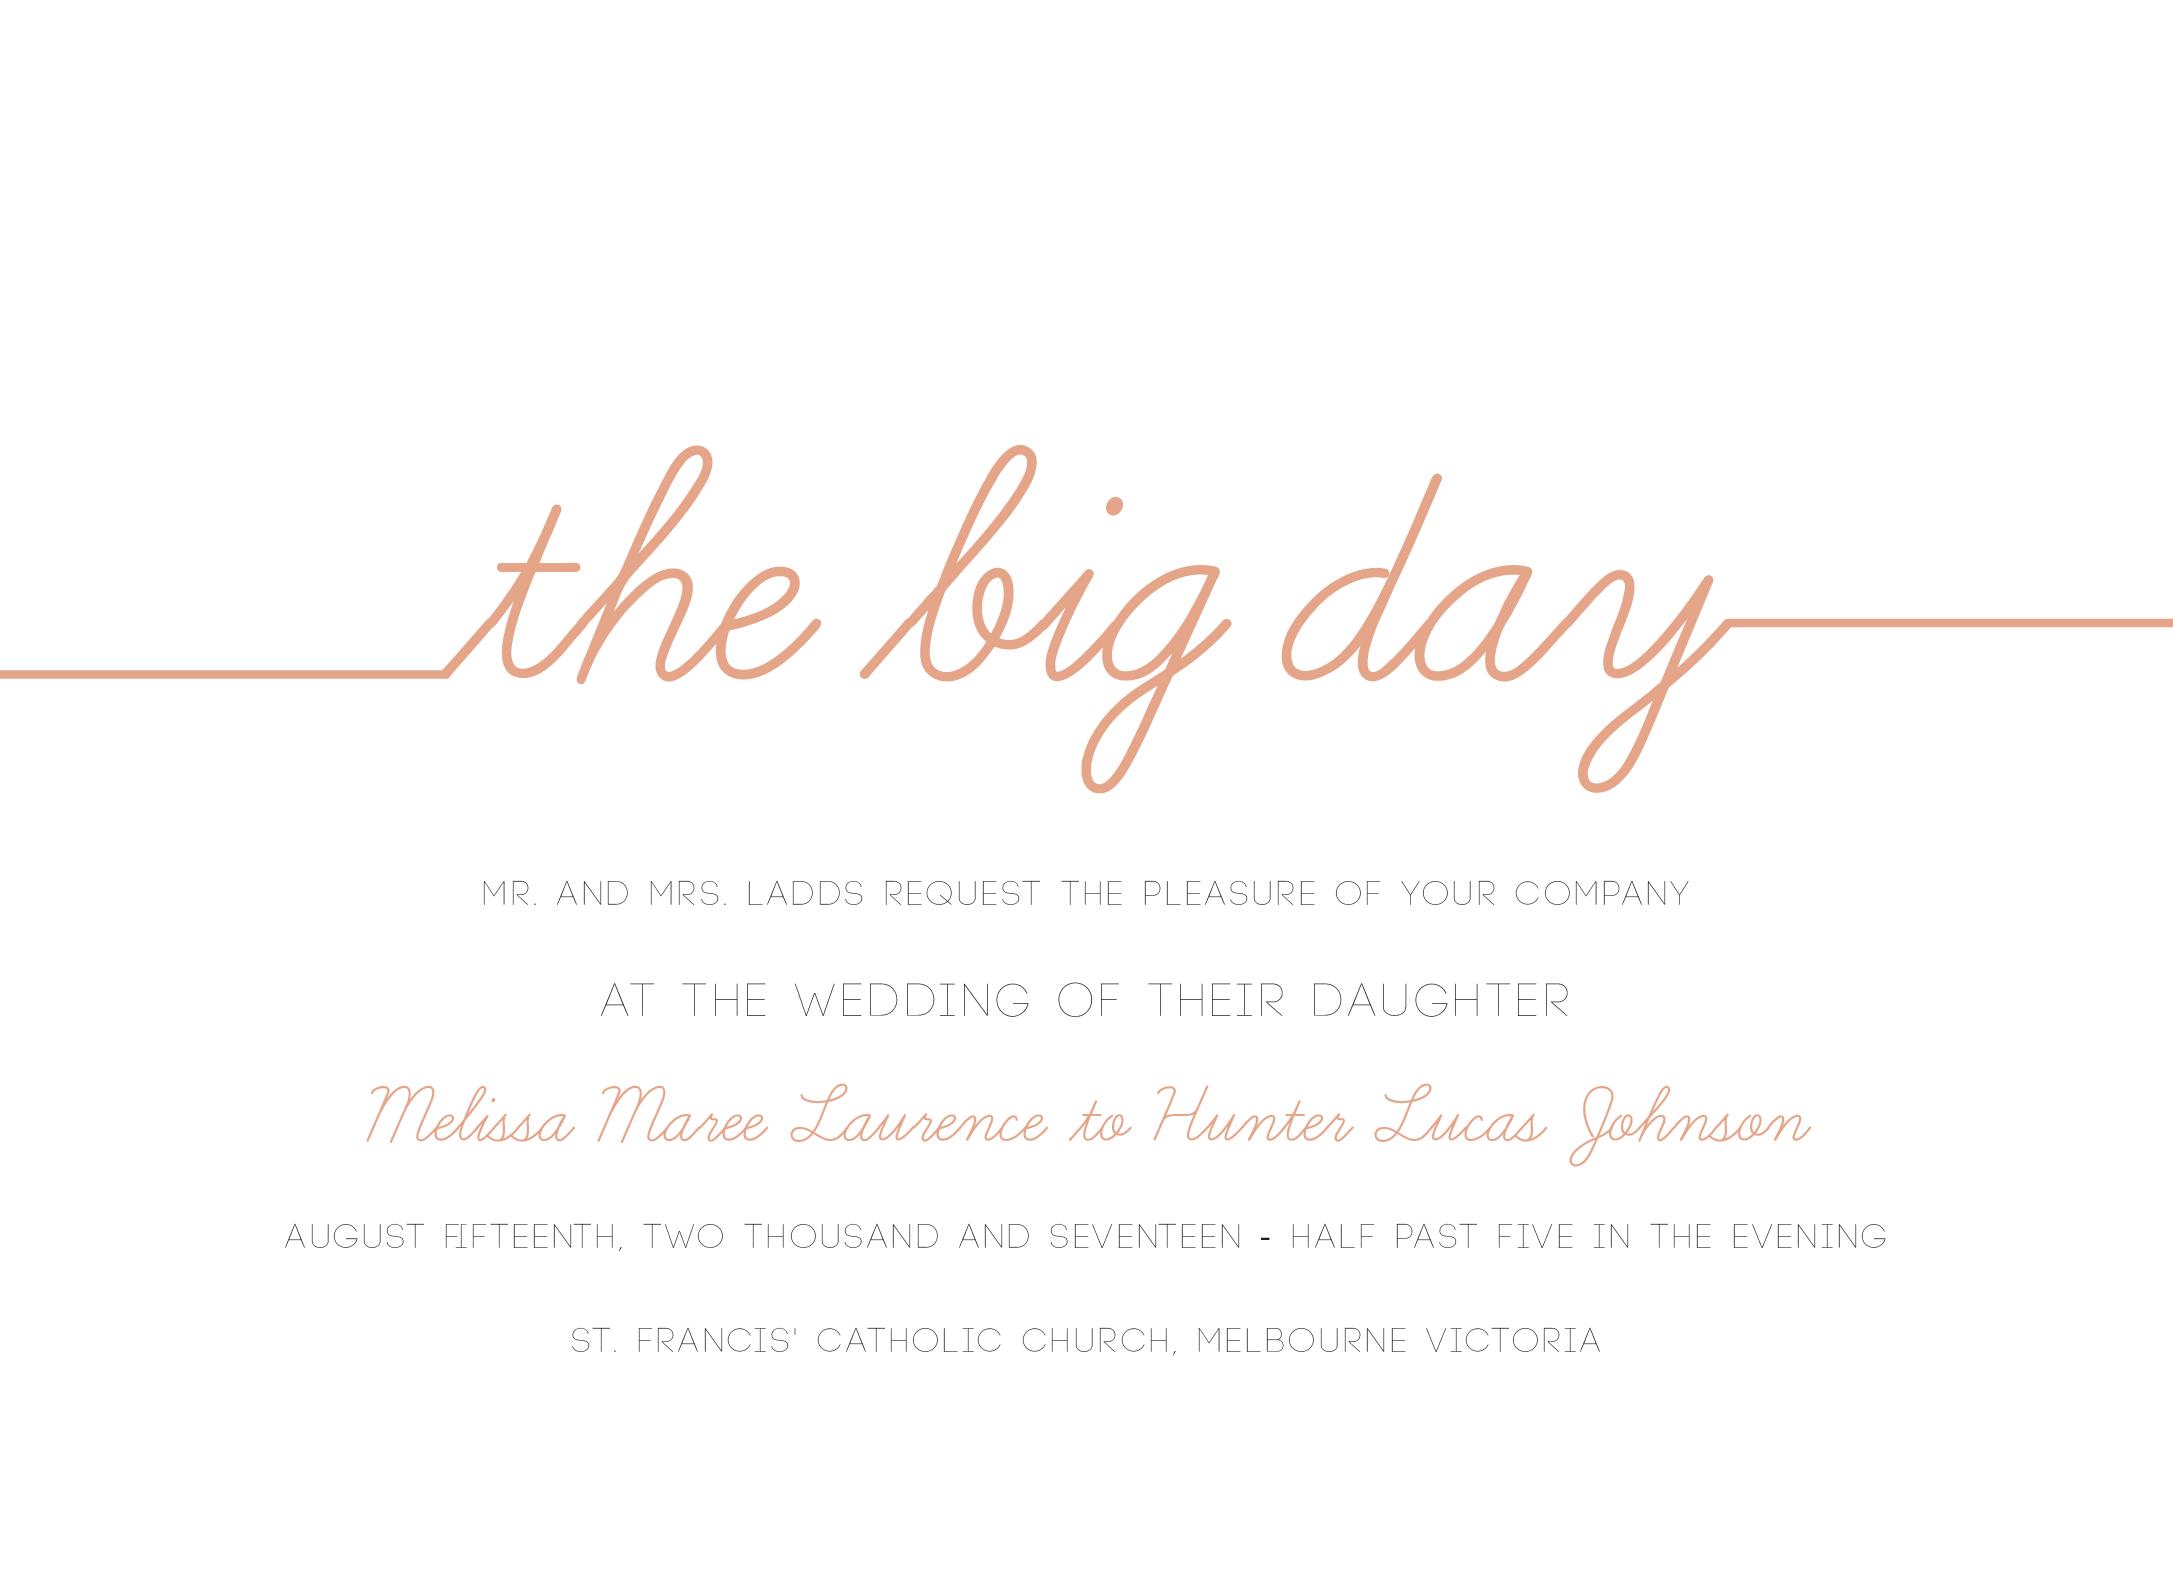 Cursive Digital Printing Wedding Invitations